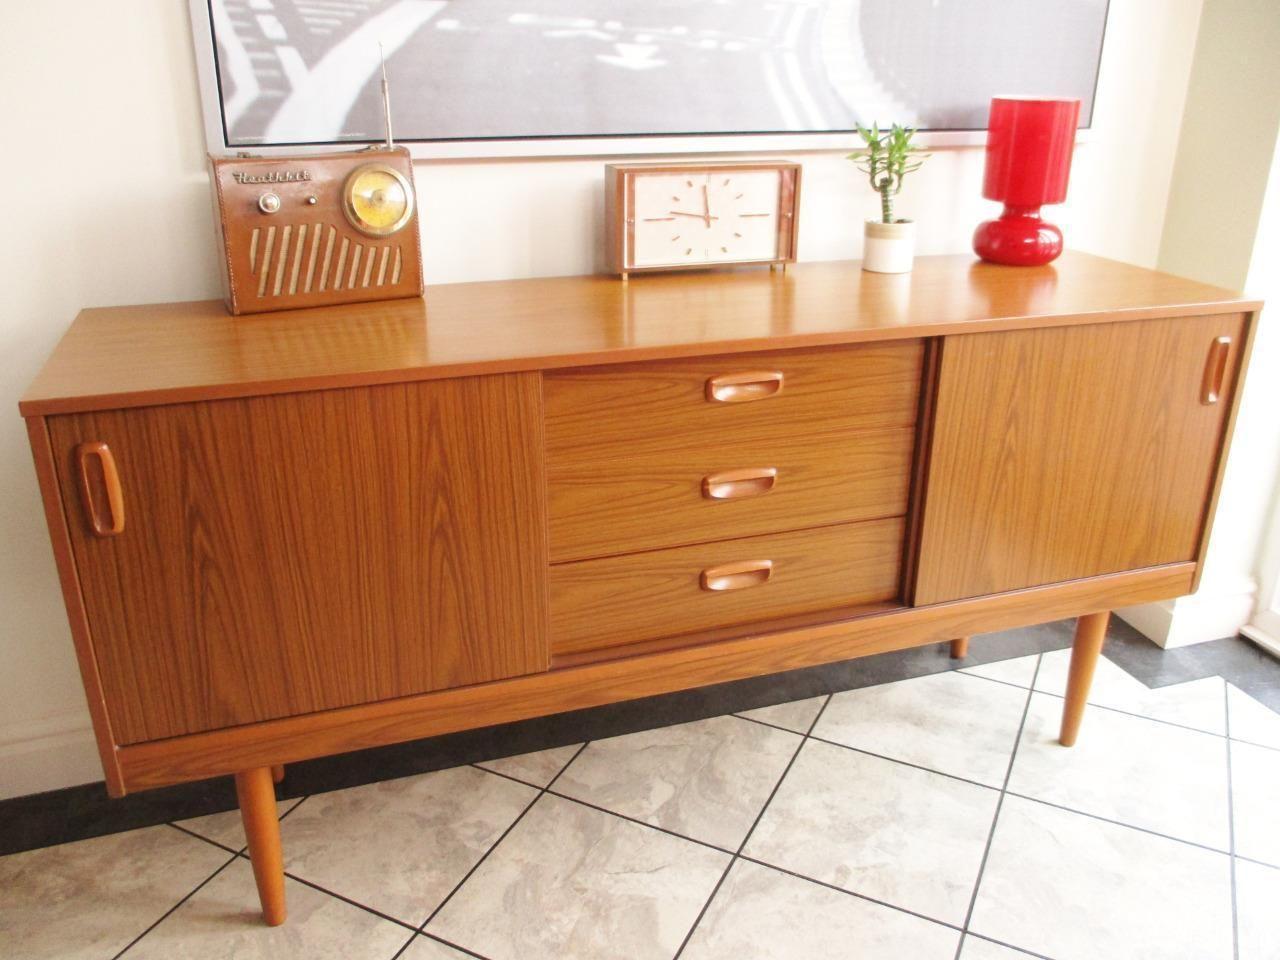 vintage 70s furniture. Painted Living Room Vintage/Retro Sideboards | EBay Vintage 70s Furniture T